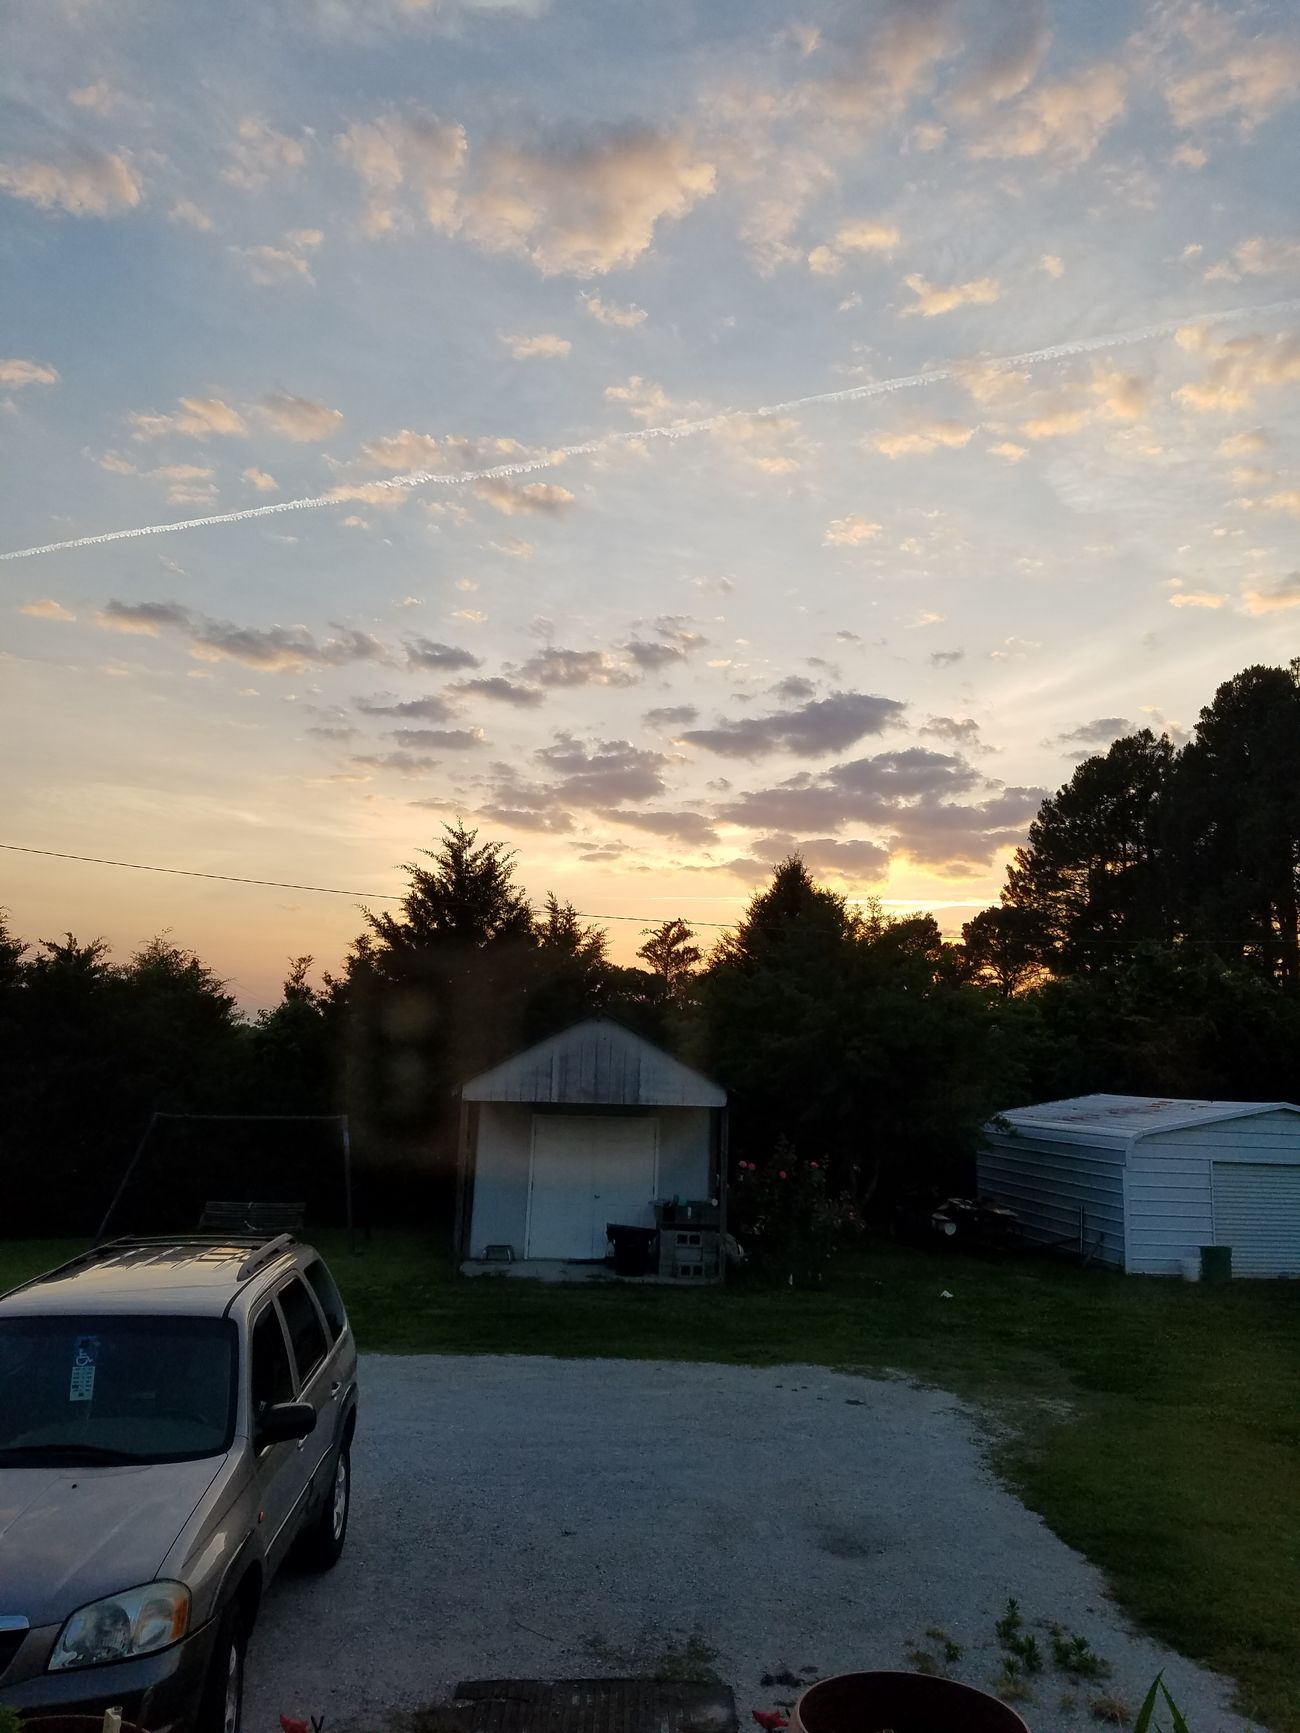 Evening Sky Ujustgotkaied Evening Sky Landscape Clouds Trees Nature First Eyeem Photo